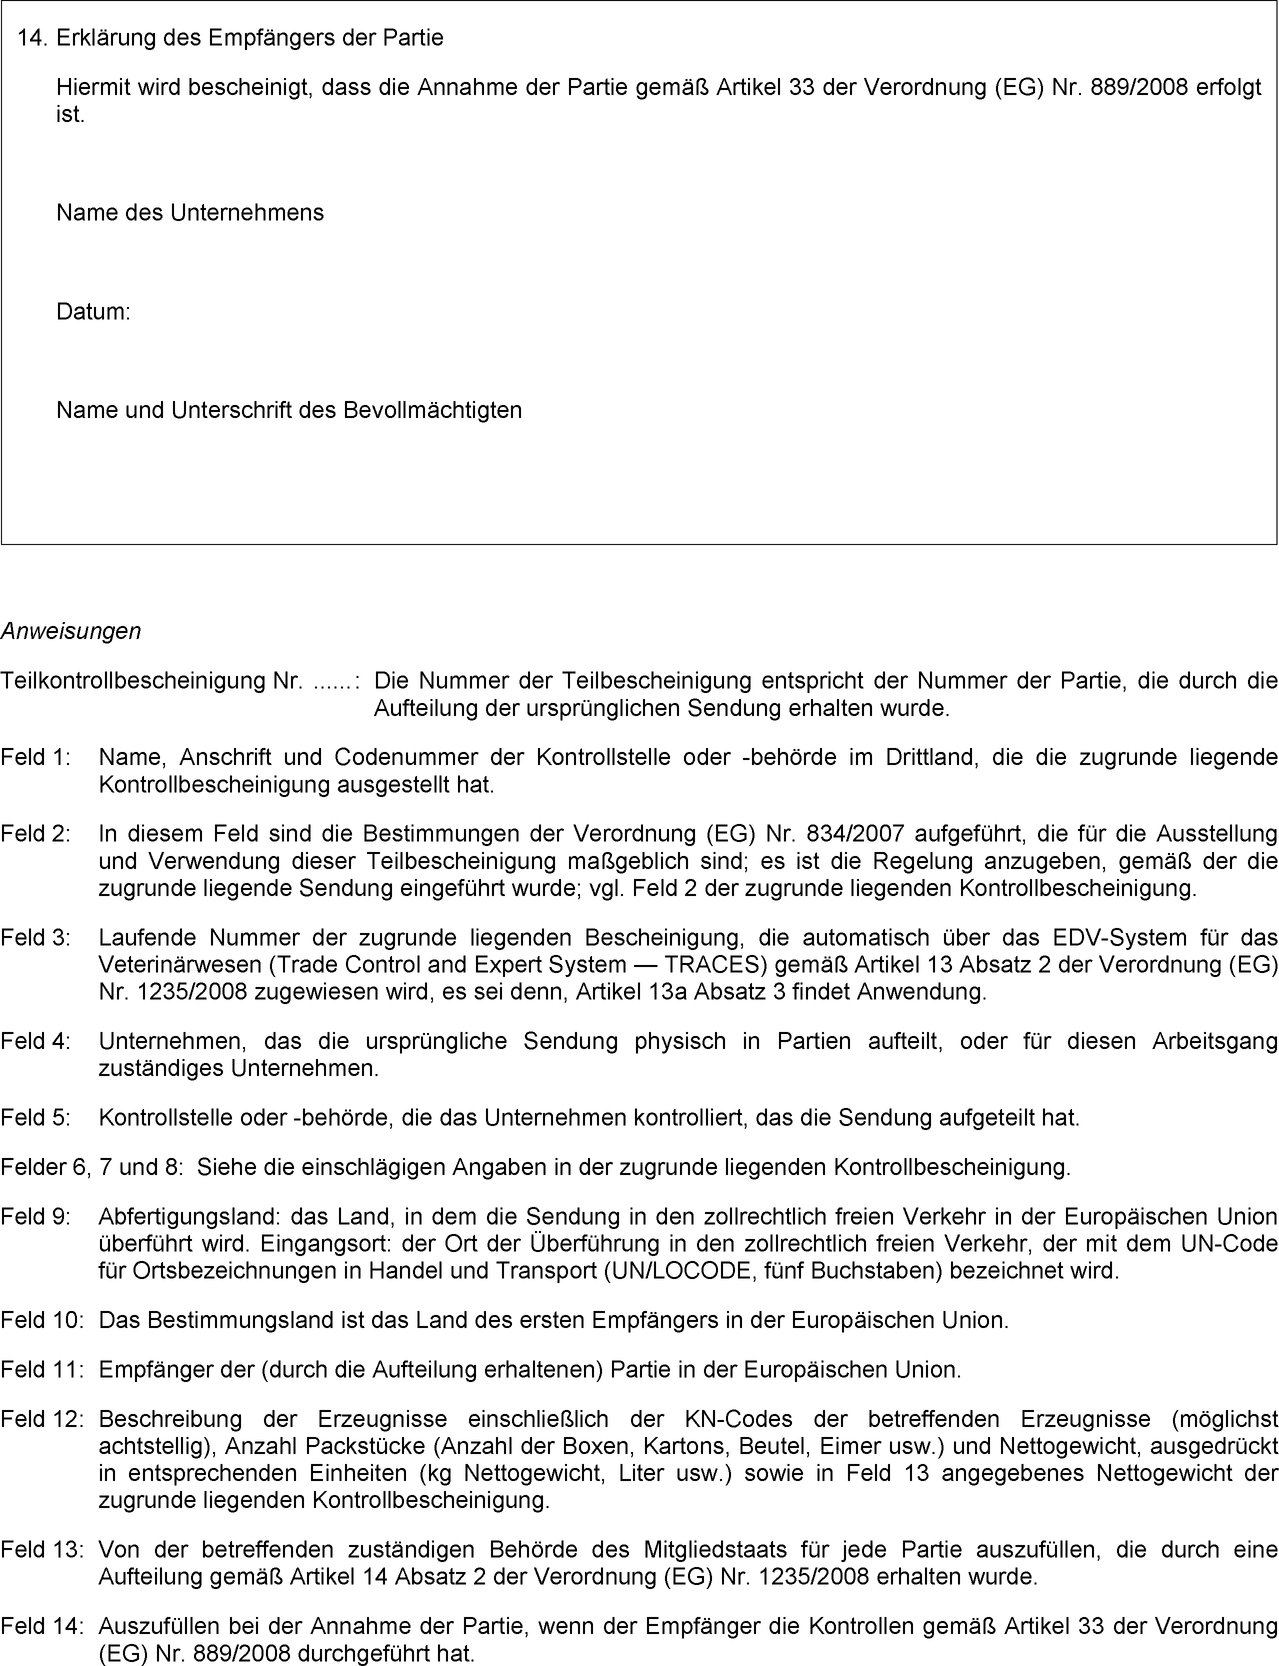 EUR-Lex - 32016R1842 - EN - EUR-Lex